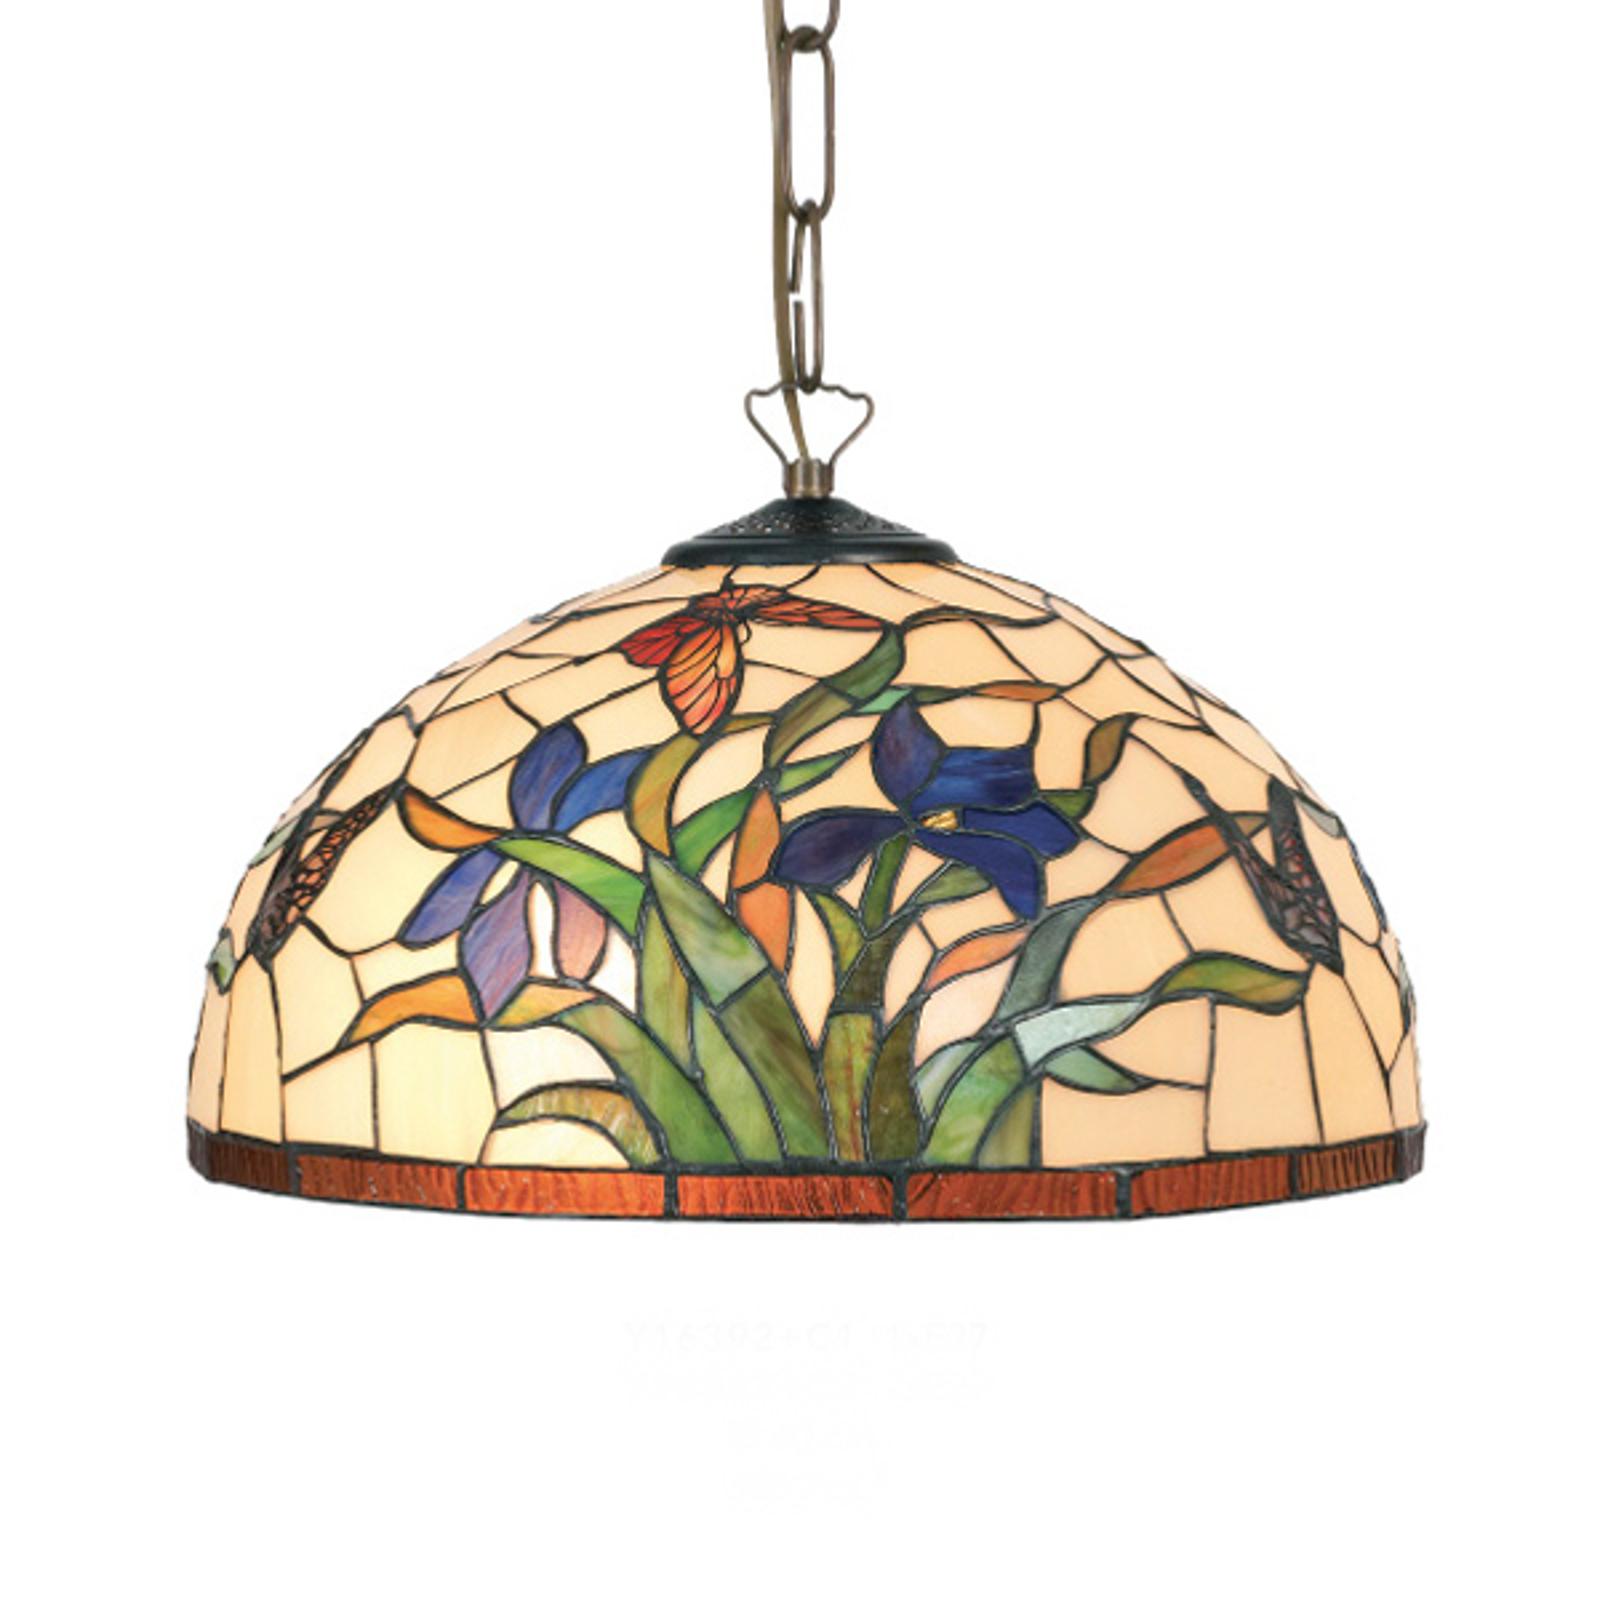 Lámpara colgante Elanda al estilo Tiffany 1 x E27